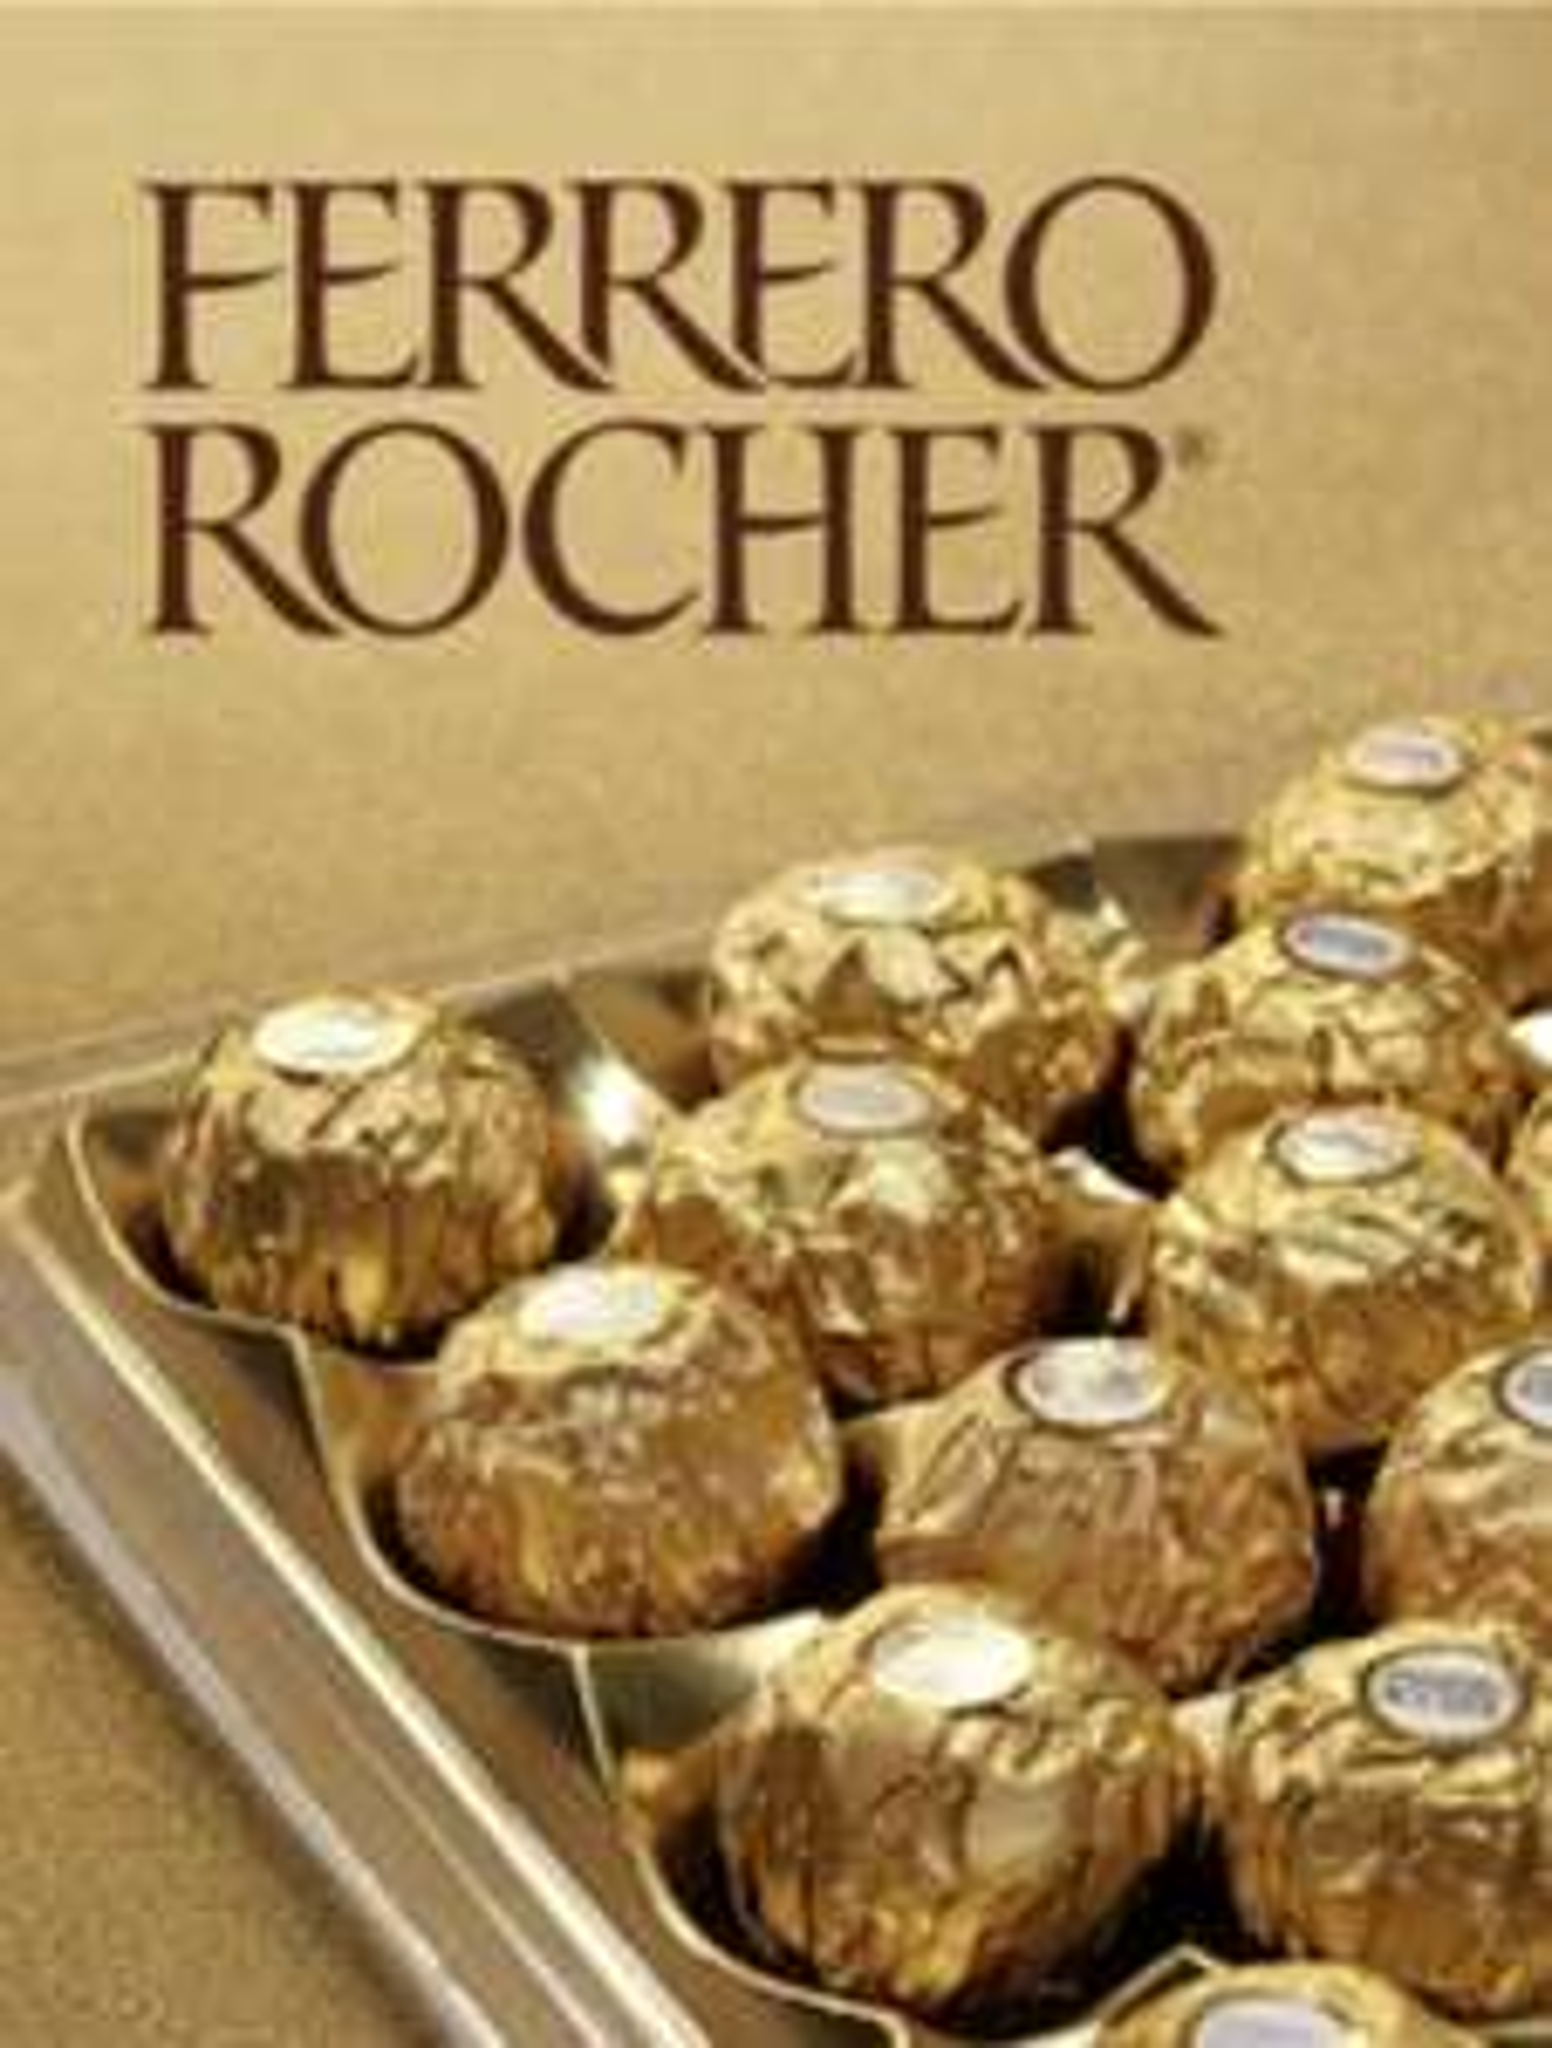 Ferrero Rocher Chocolate Easter Gift Set, Box of 24 Chocolates £5.99 Prime / £5.69 S&S / +£4.49 Non Prime @ Amazon